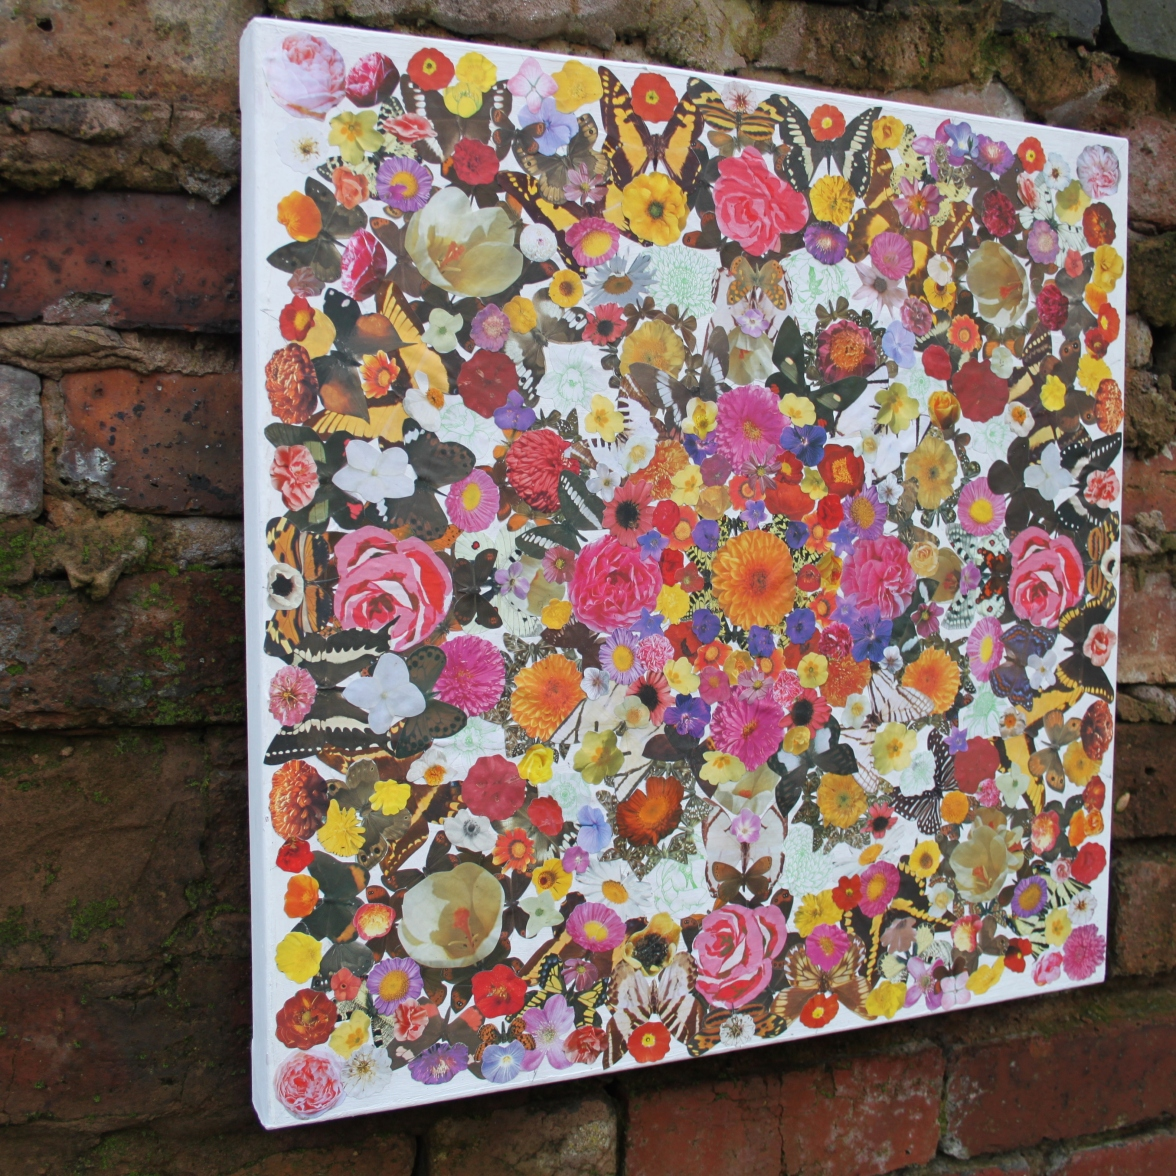 Kaleidoscope (6) Mixed Media on canvas 53 cm x 53 cm £75.00